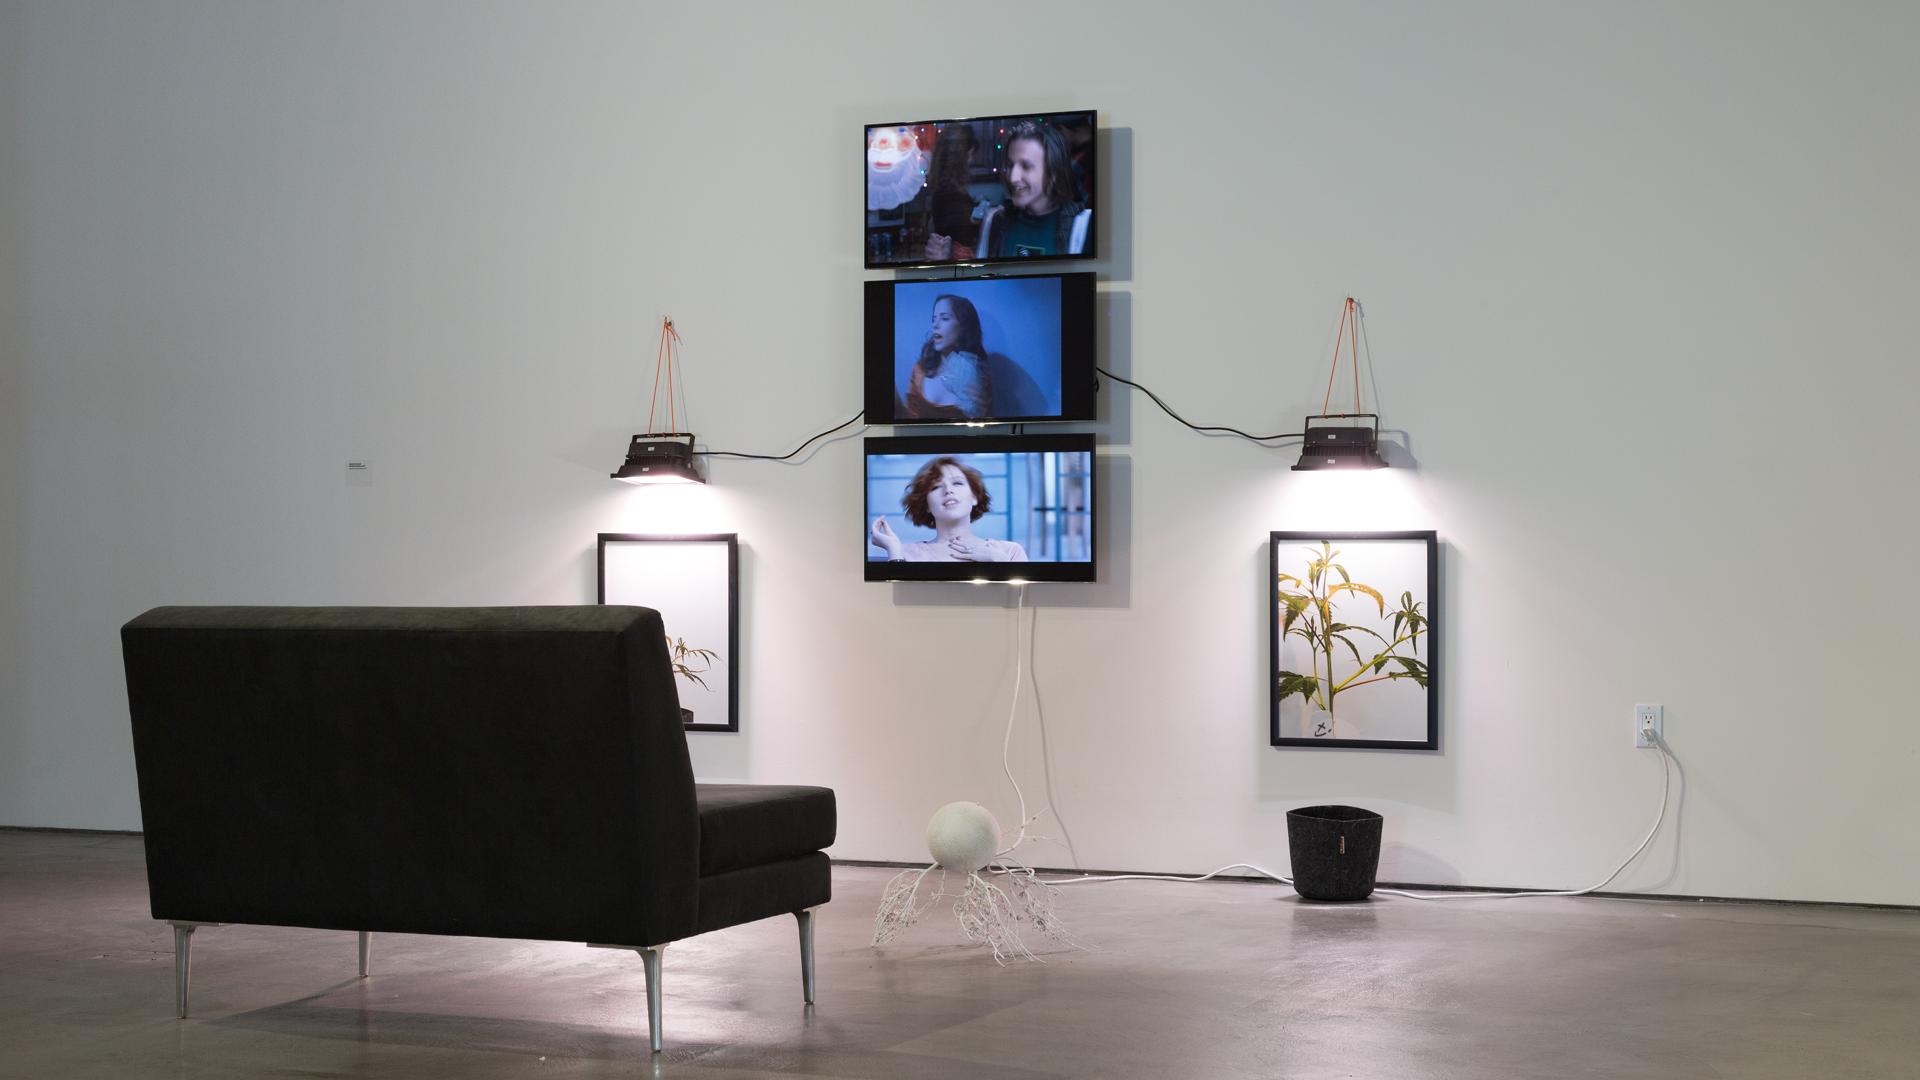 3 Channel Video Art Installation